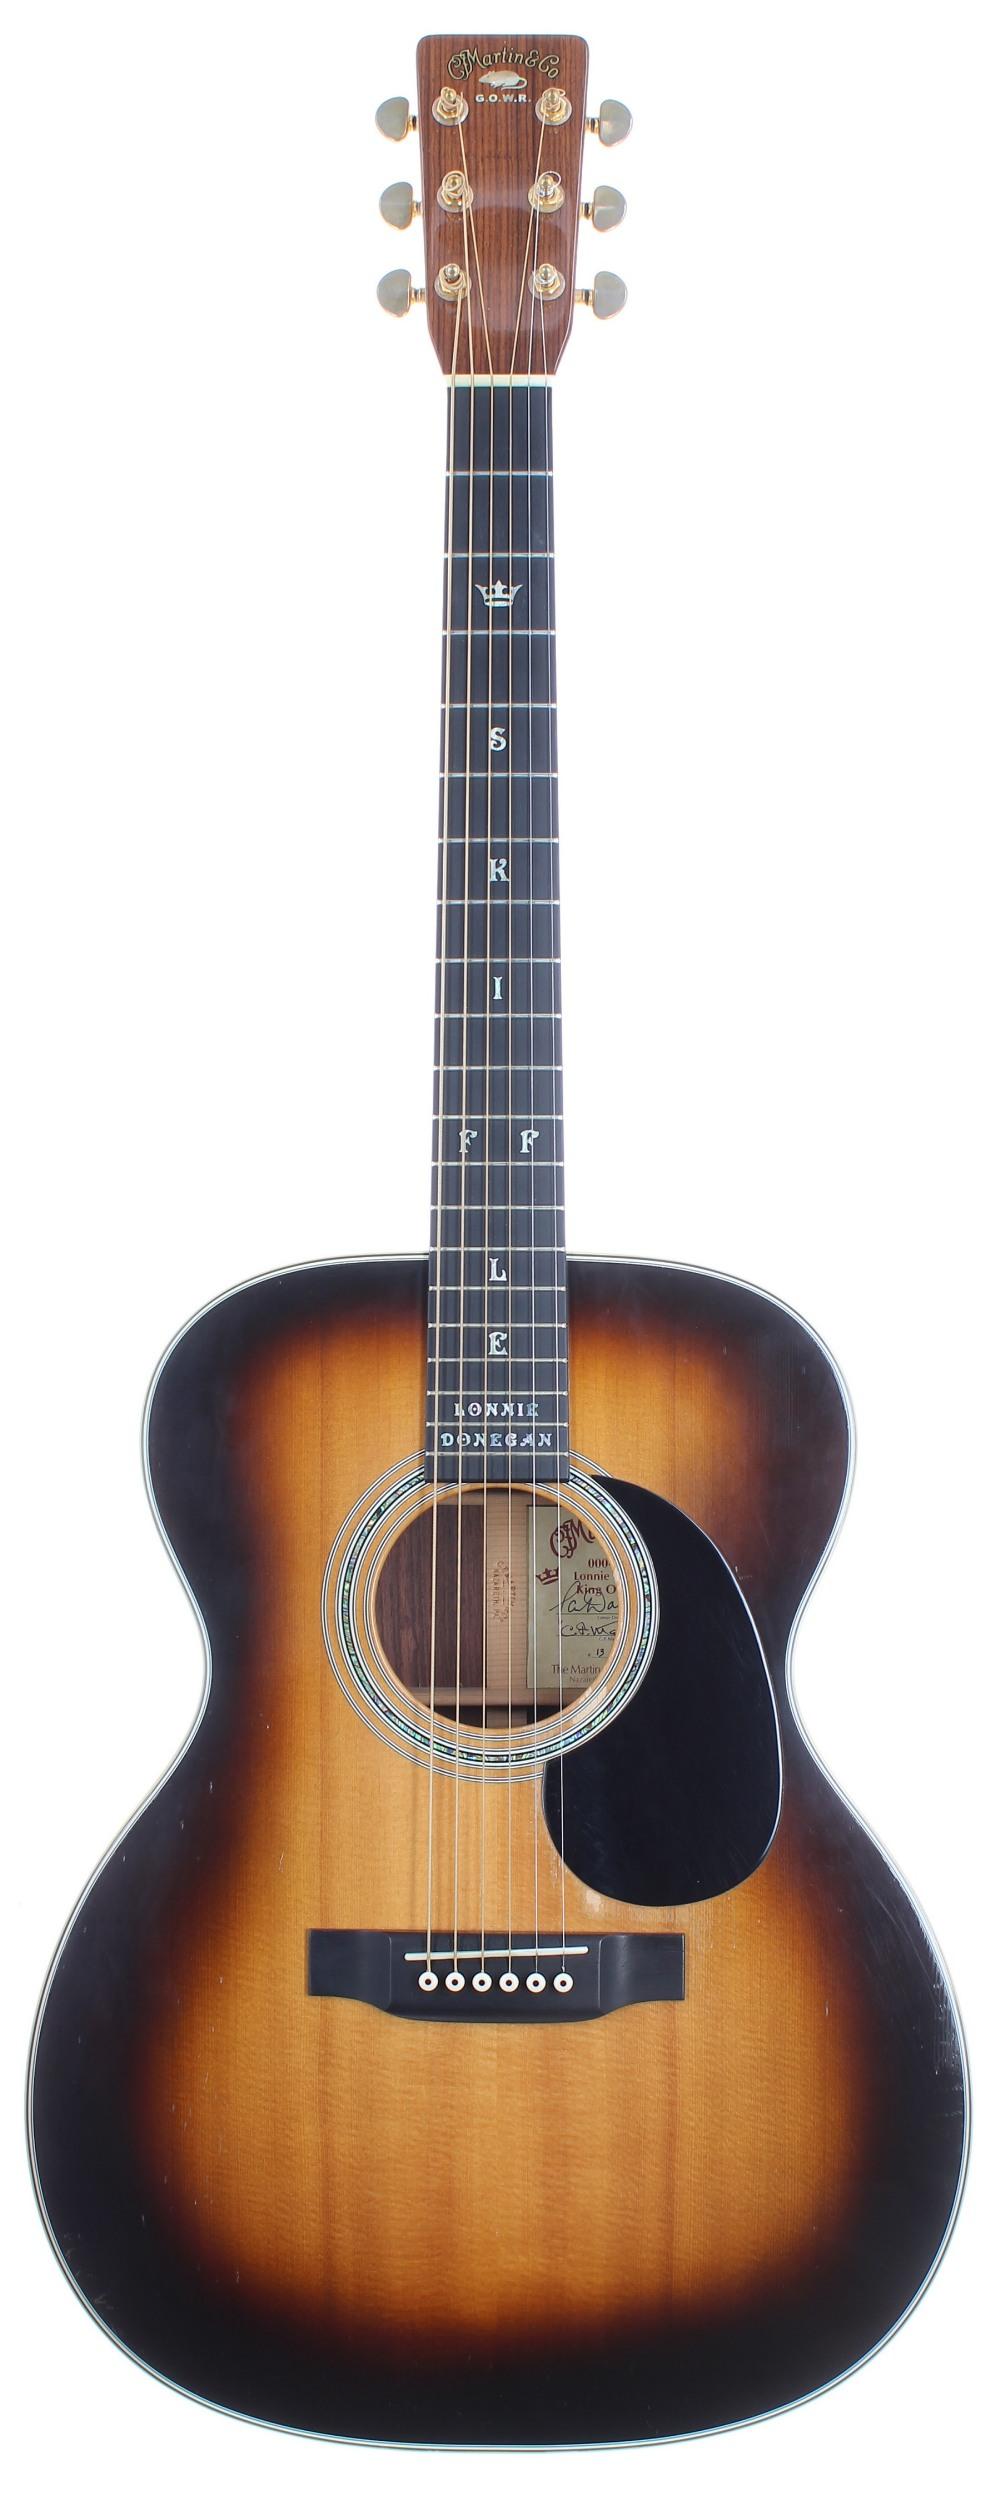 Peter Donegan - Rare 2002 C.F. Martin & Co 000-28LD (Lonnie Donegan signature model) (13-72)